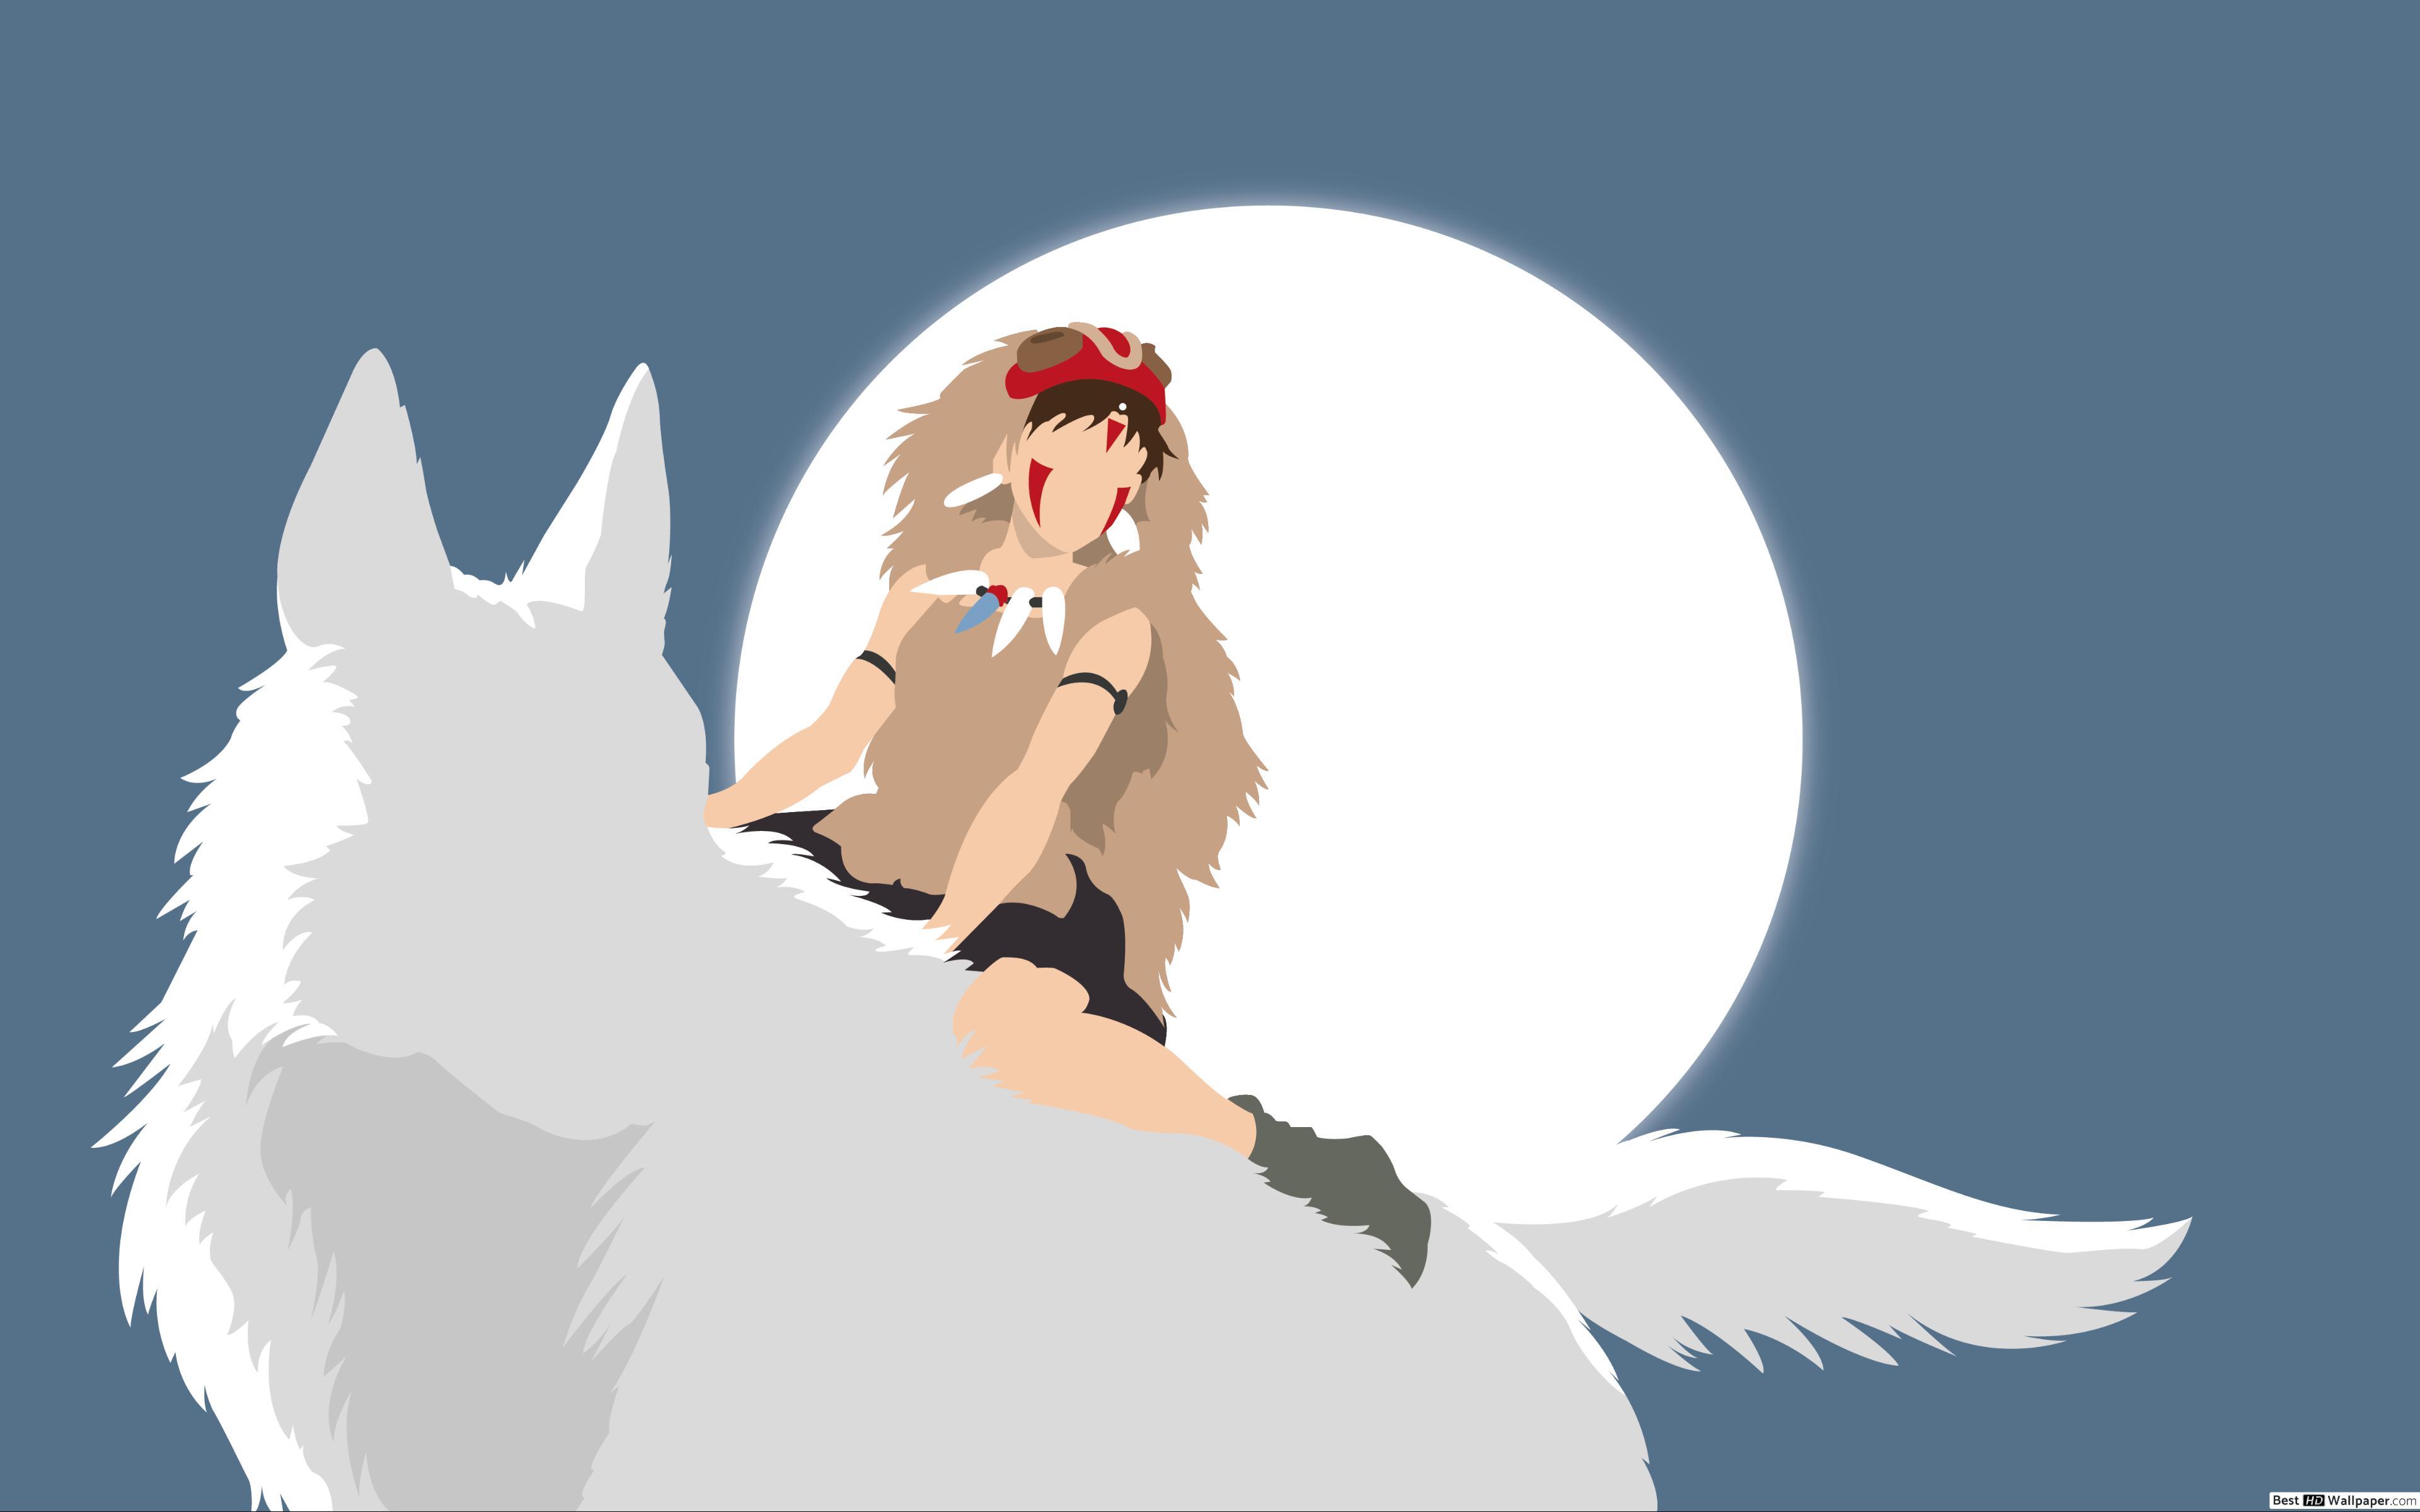 Princesa Mononoke Background 1080p 3150173 Hd Wallpaper Backgrounds Download